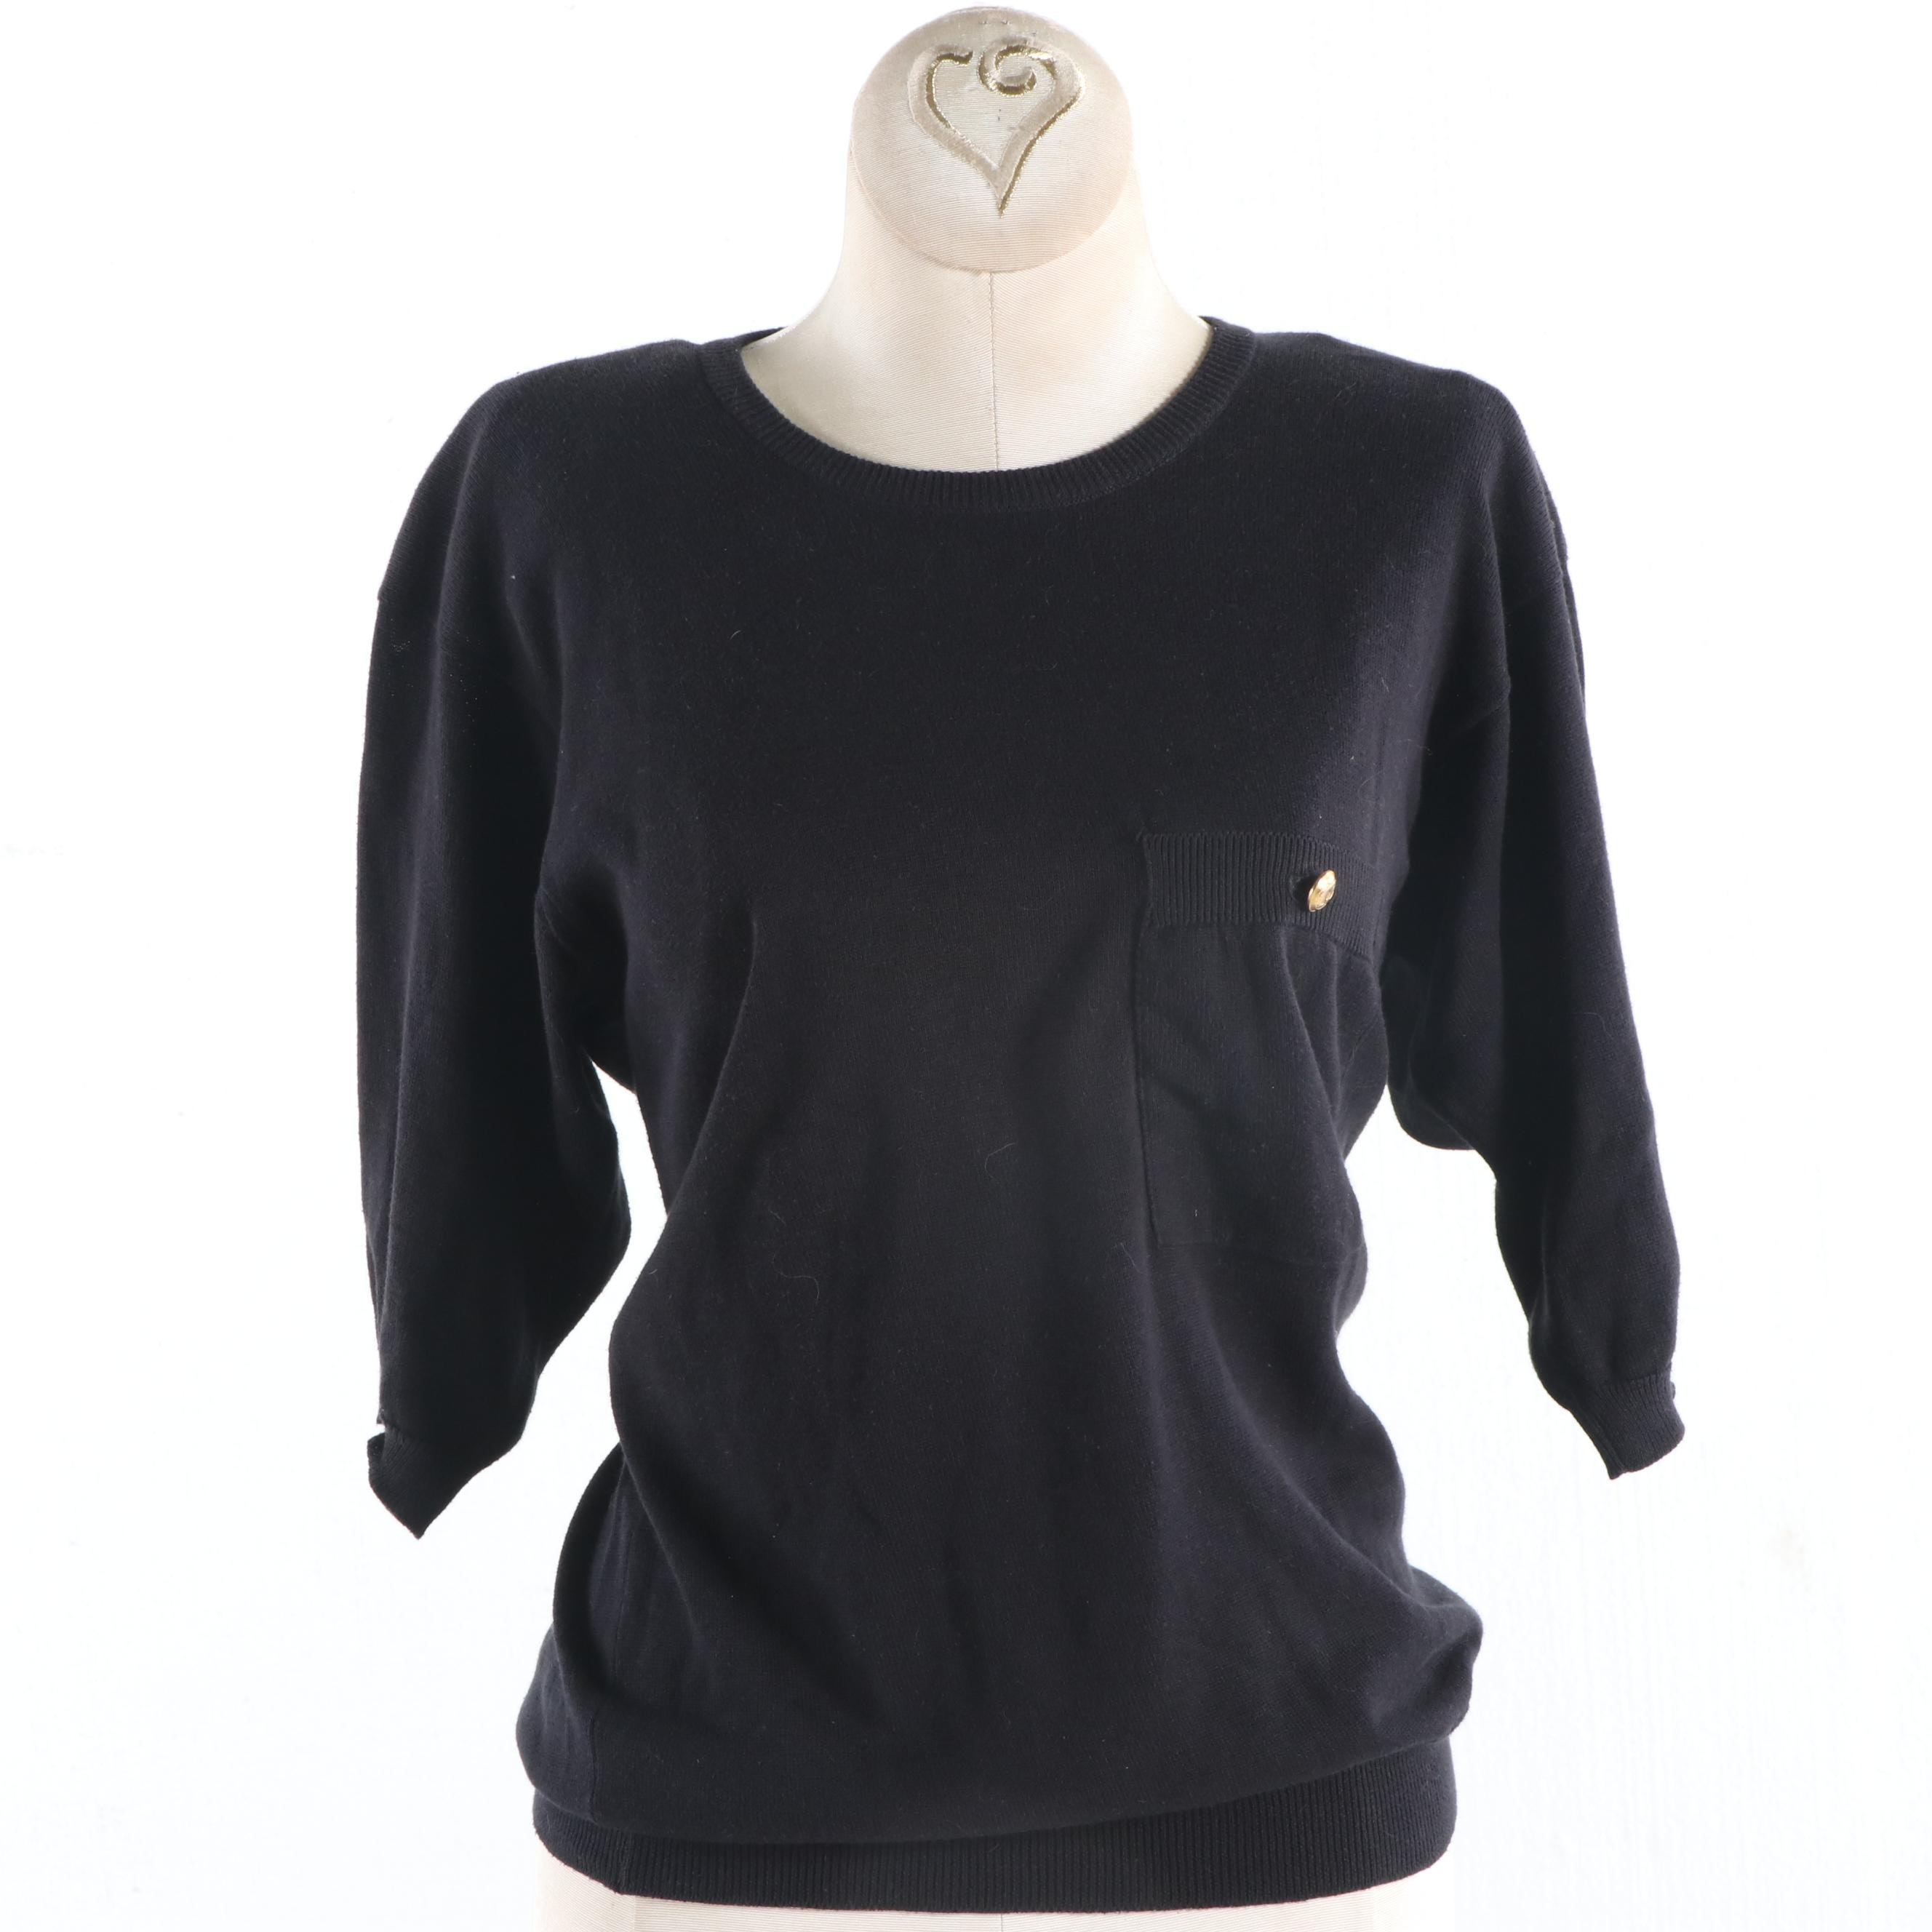 Women's Chanel Black Cotton Knit Sweater, 1980s Vintage